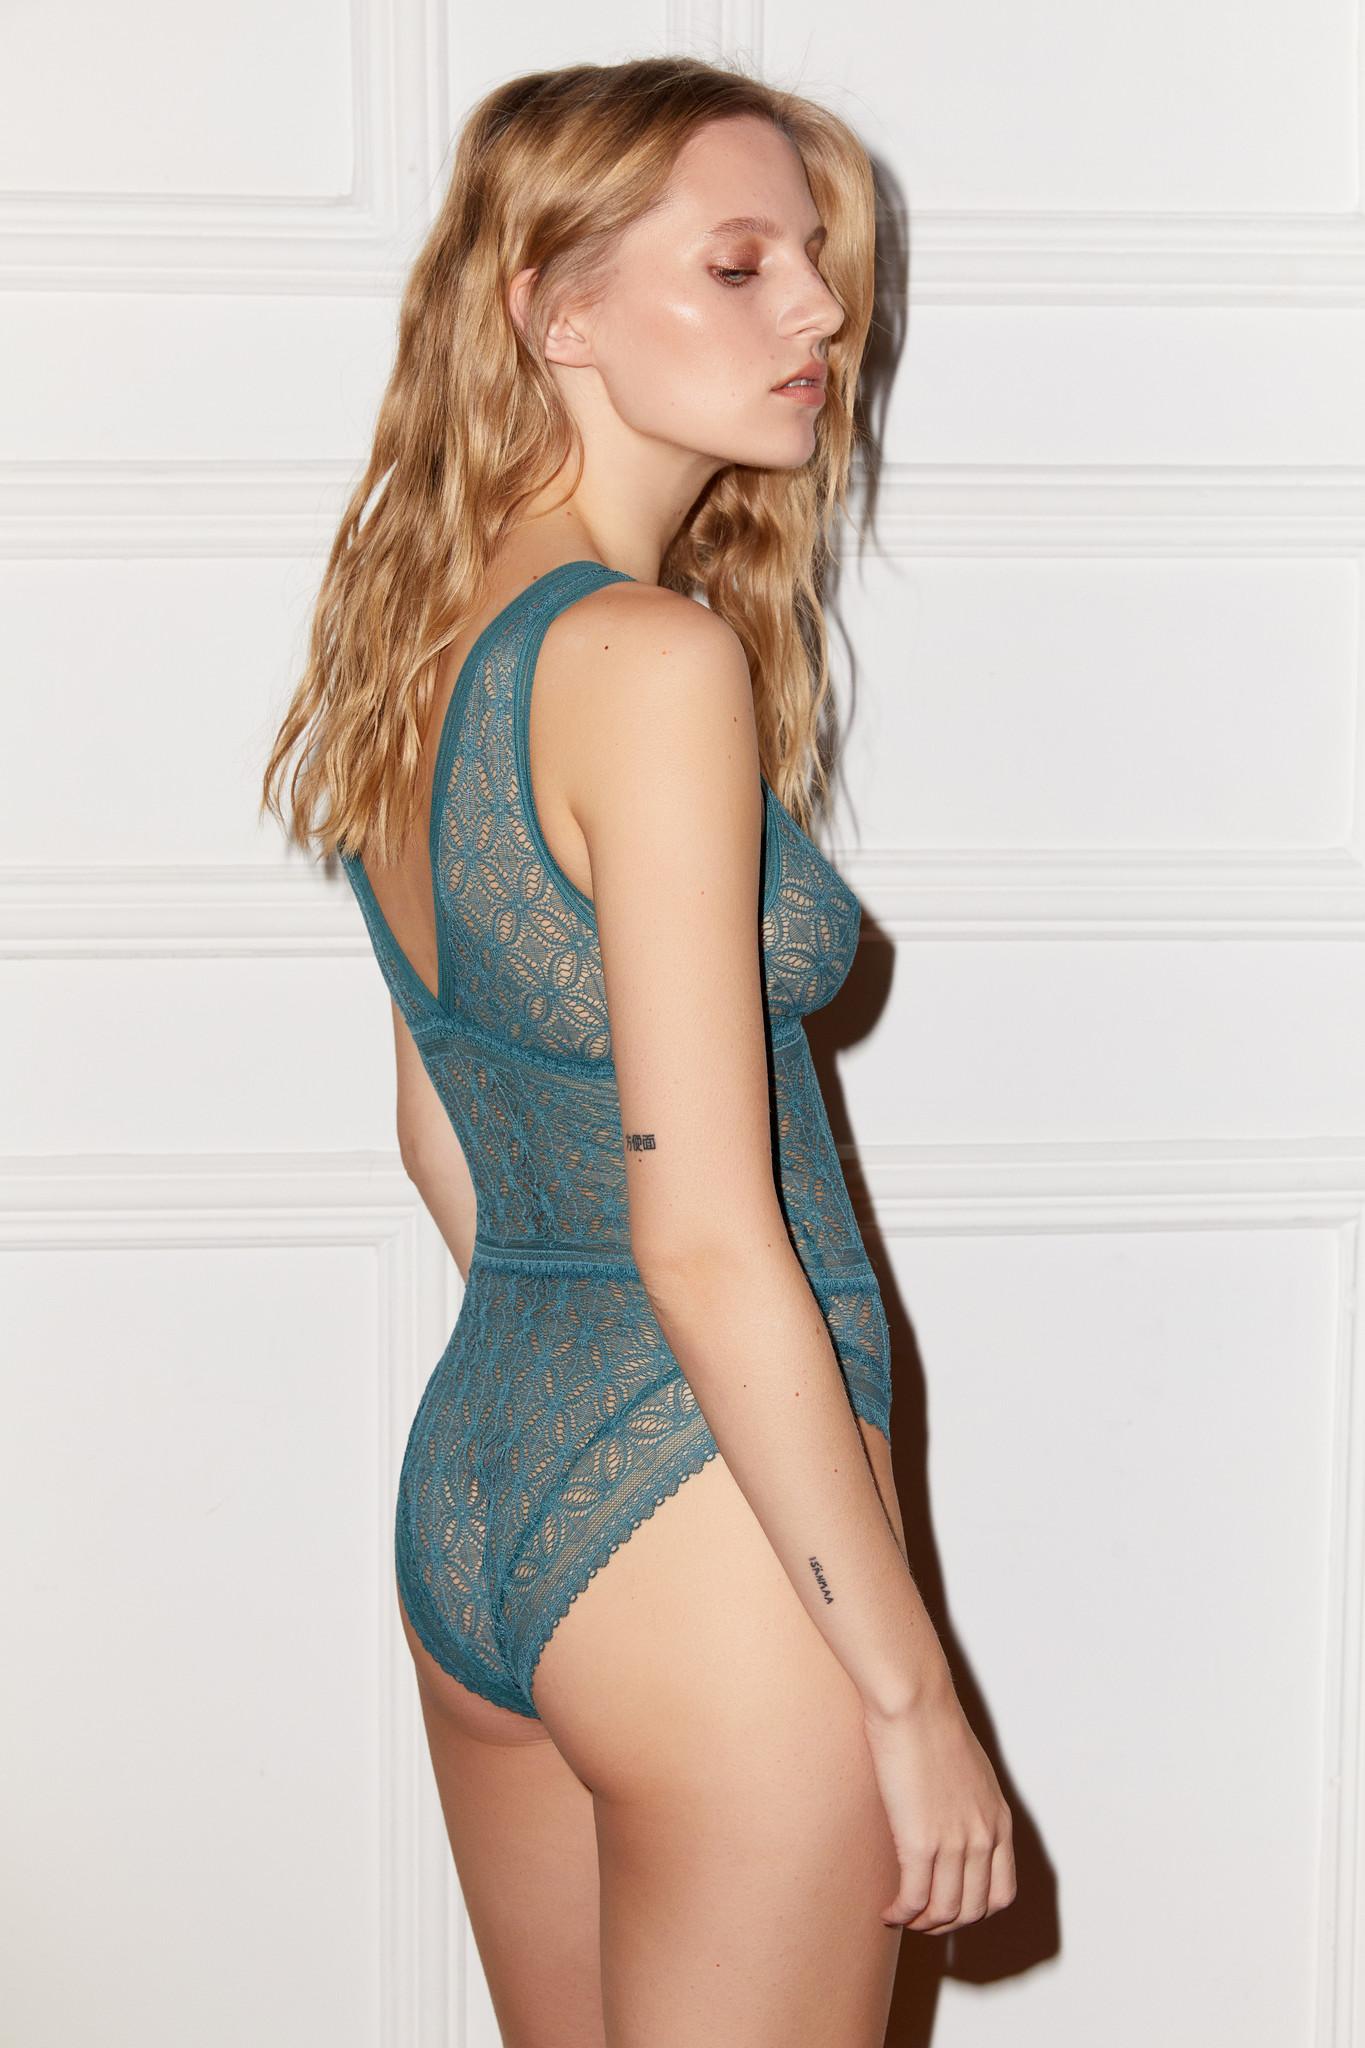 Else Chloe bodysuit